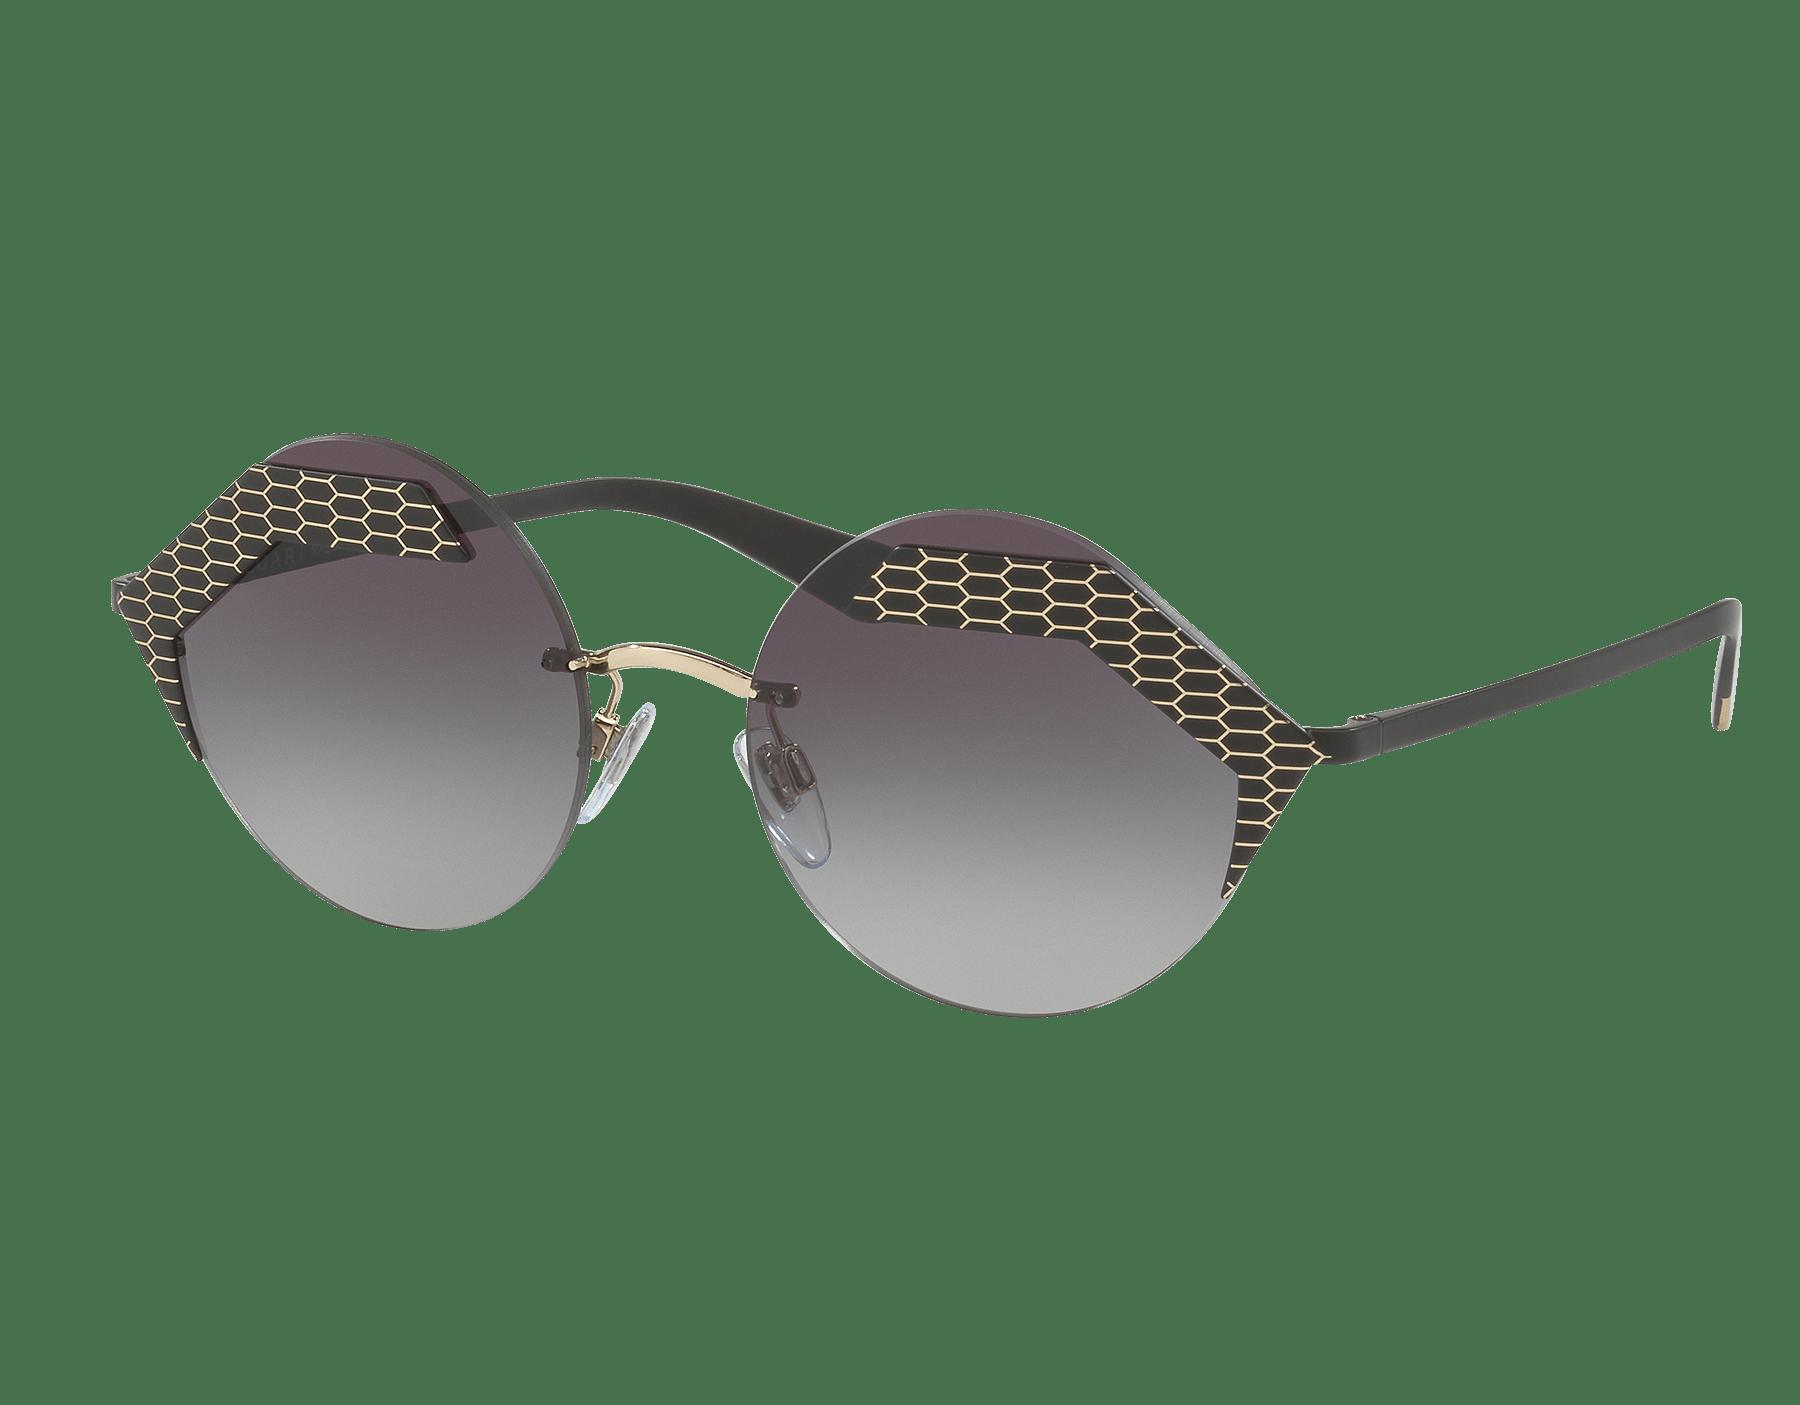 Bulgari 'Serpenteyes' hexagonal metal frame sunglasses with flat round lenses. 903234 image 1